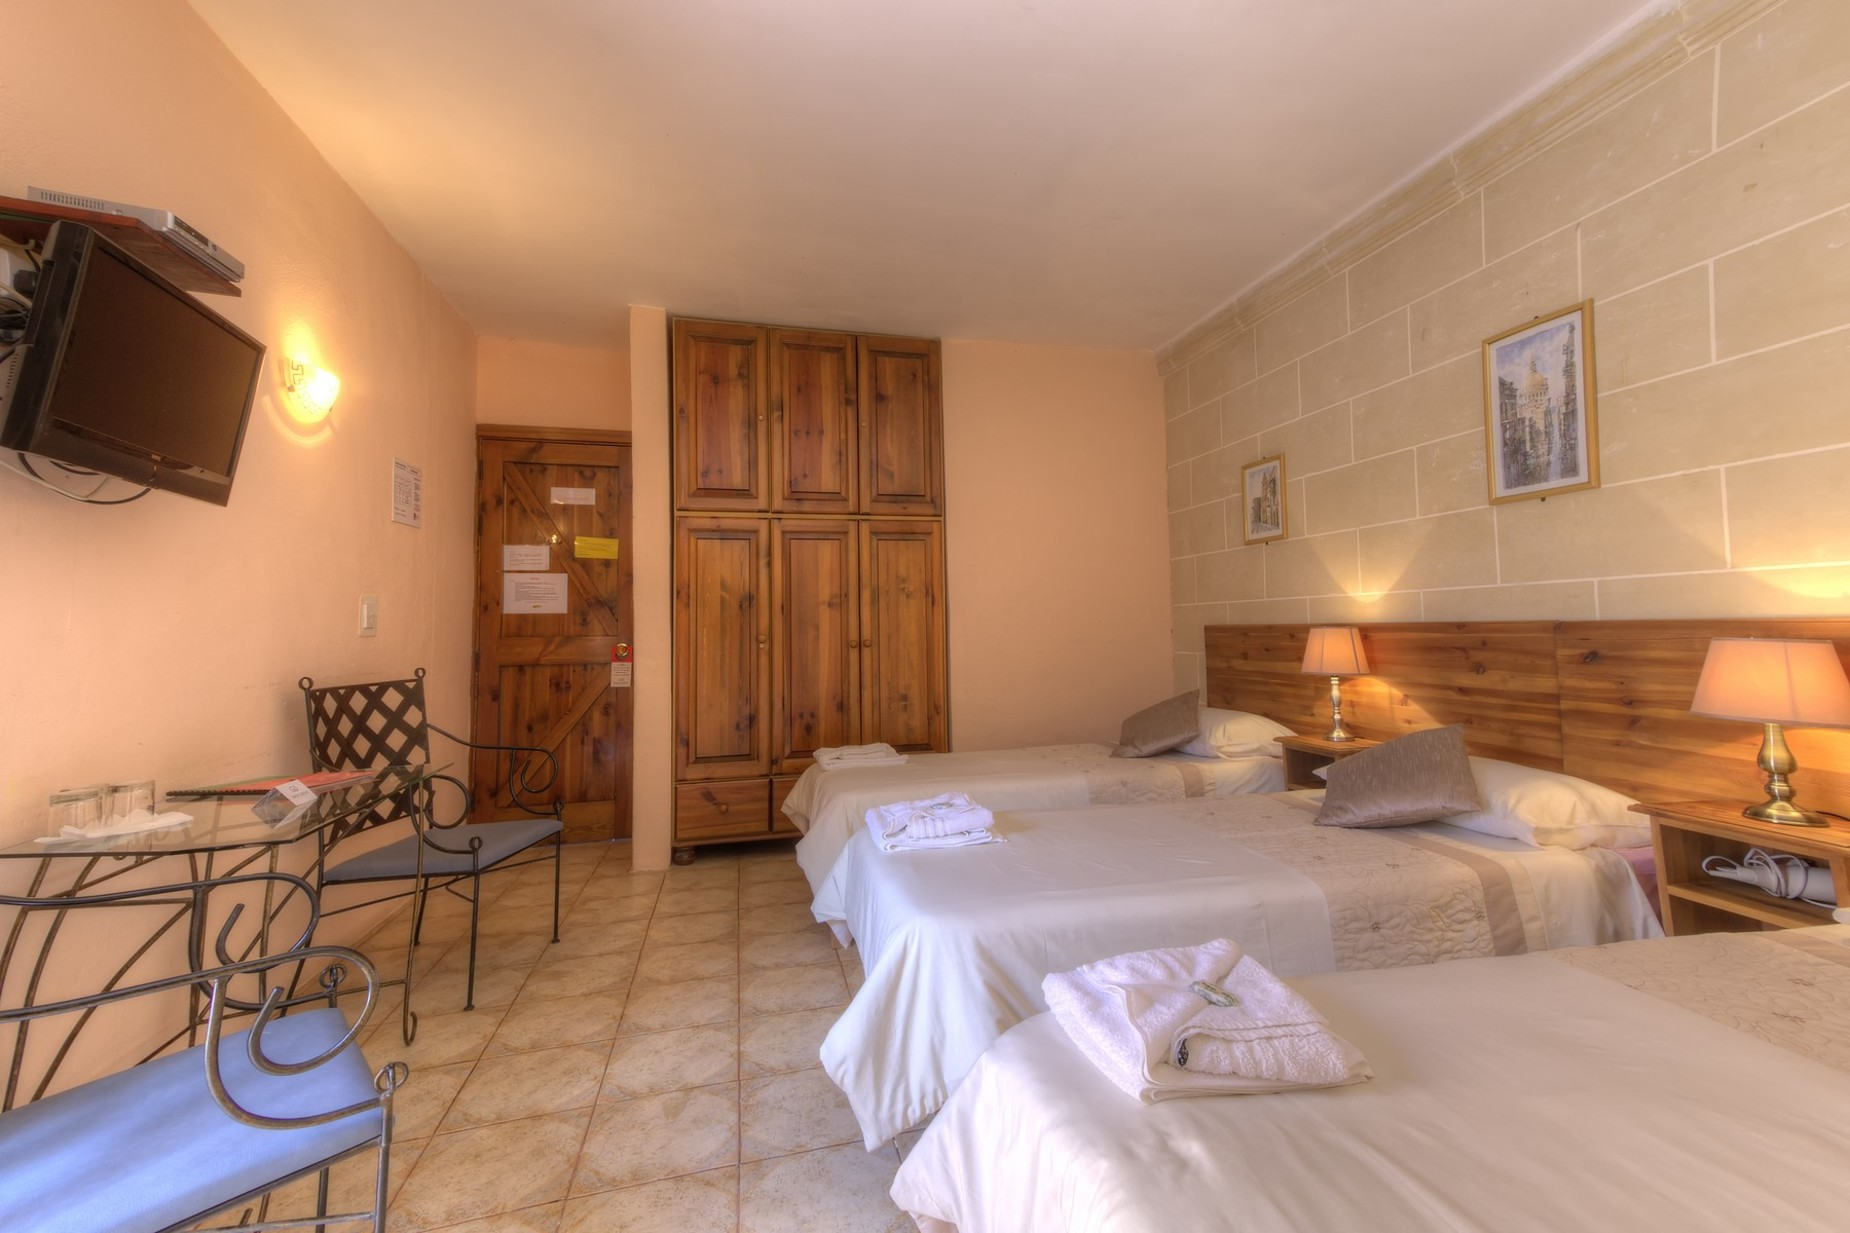 0 bed Hotel For Rent in Swieqi, Swieqi - thumb 9